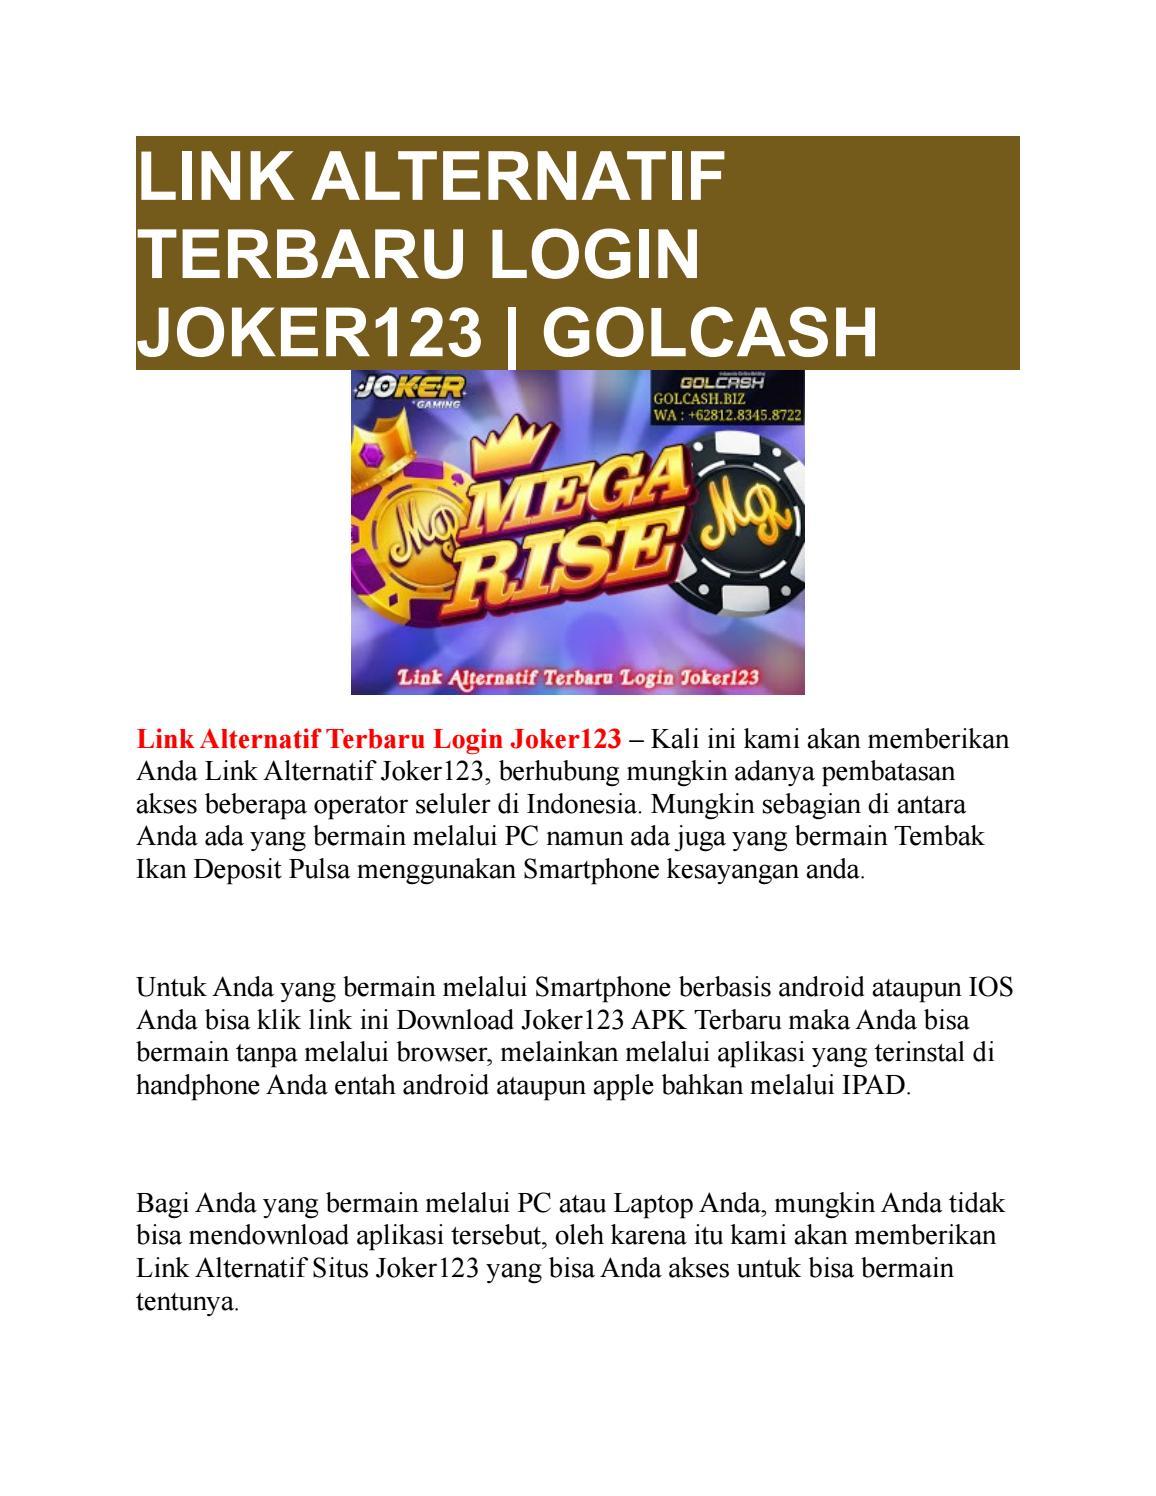 Link Alternatif Terbaru Login Joker123 Golcash By Golcash Issuu